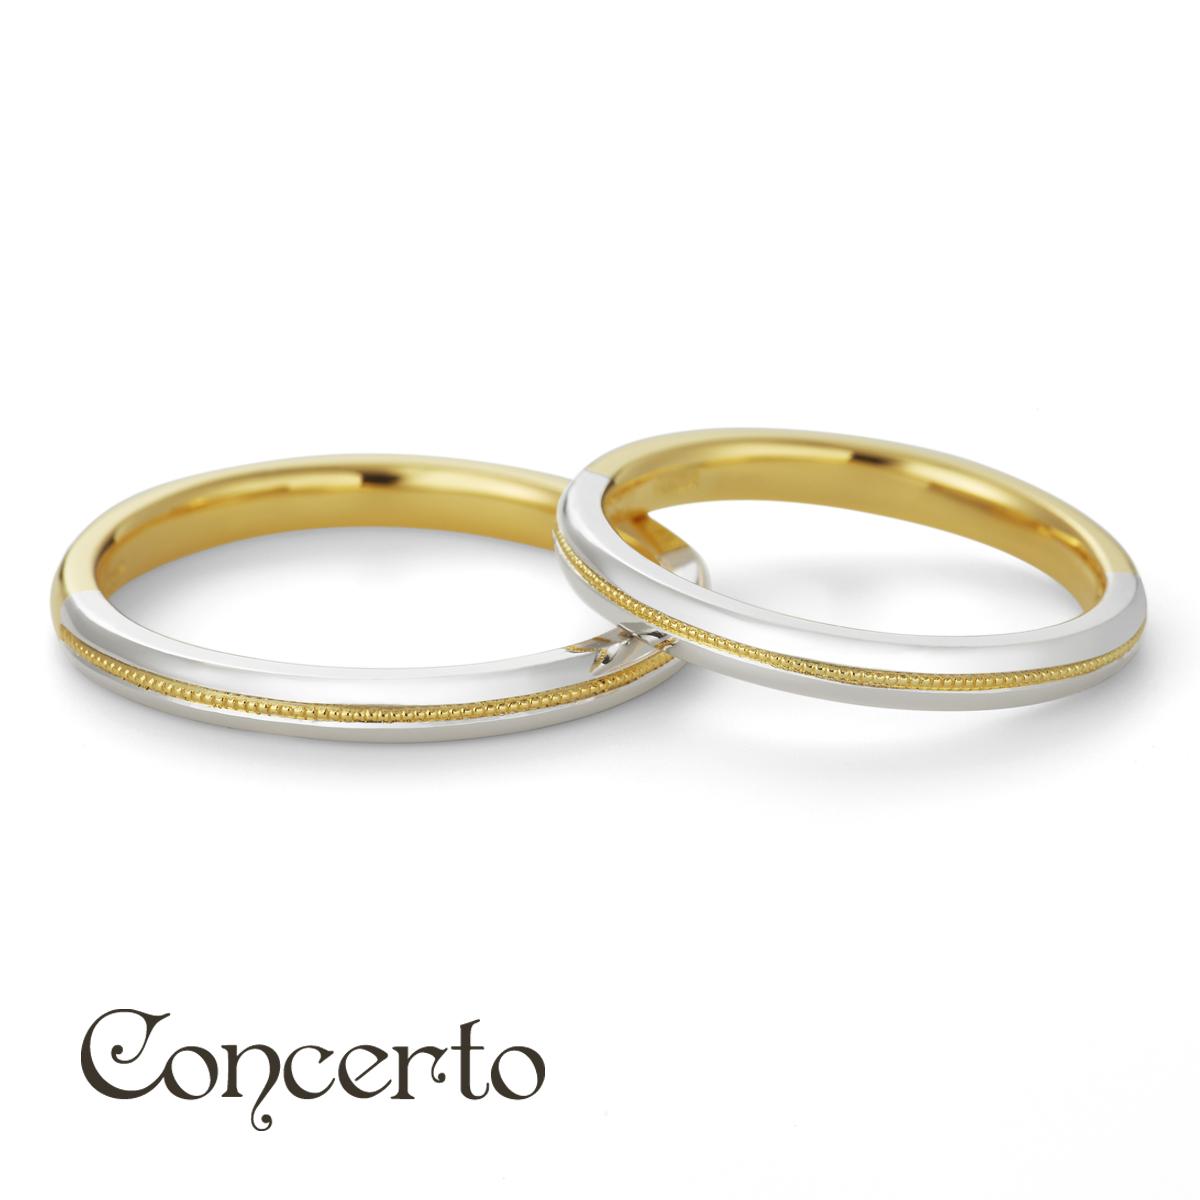 legato(レガート)